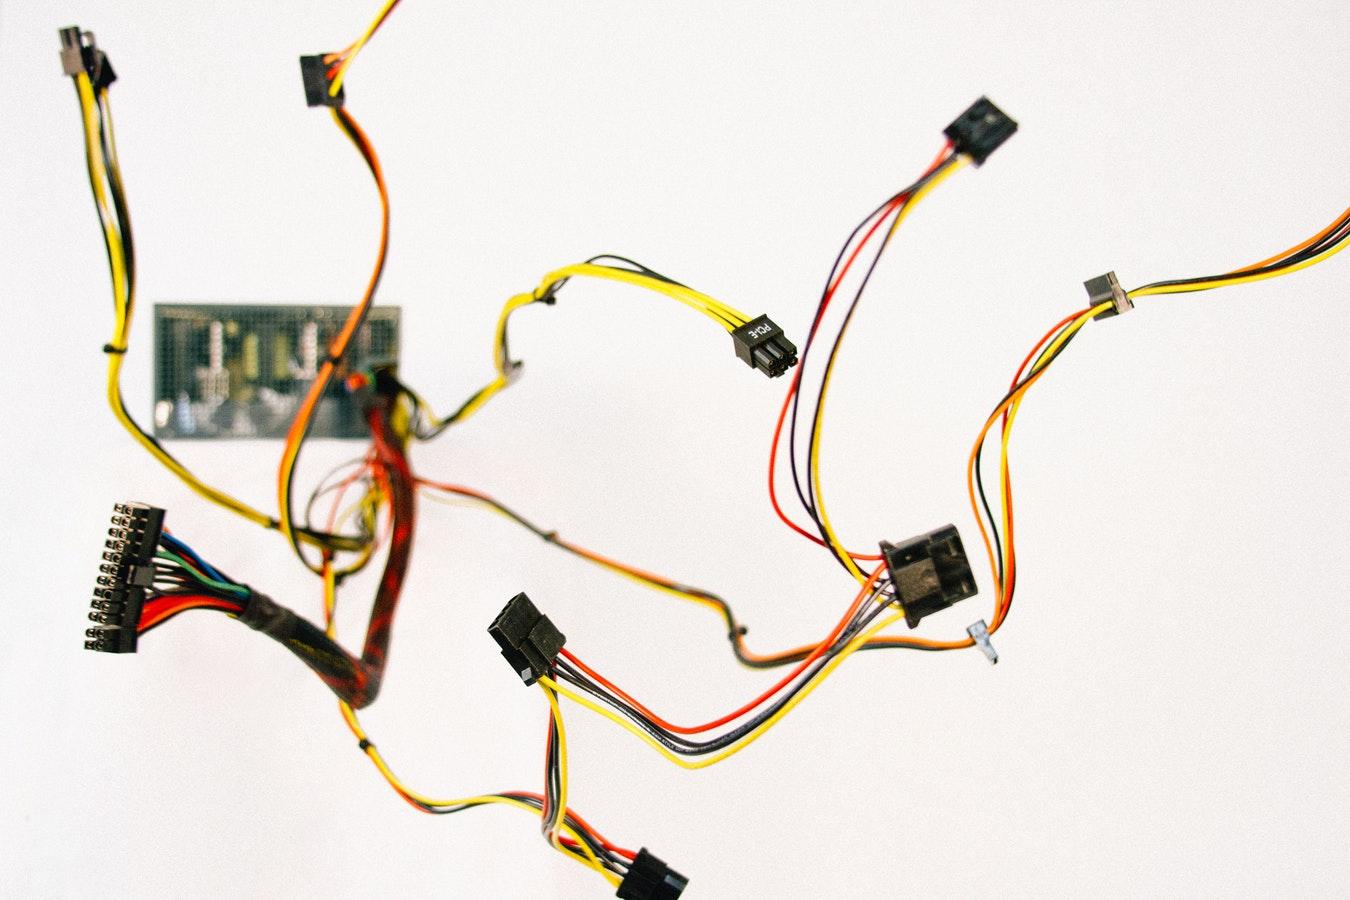 ADHD and gamer circuitry like brain